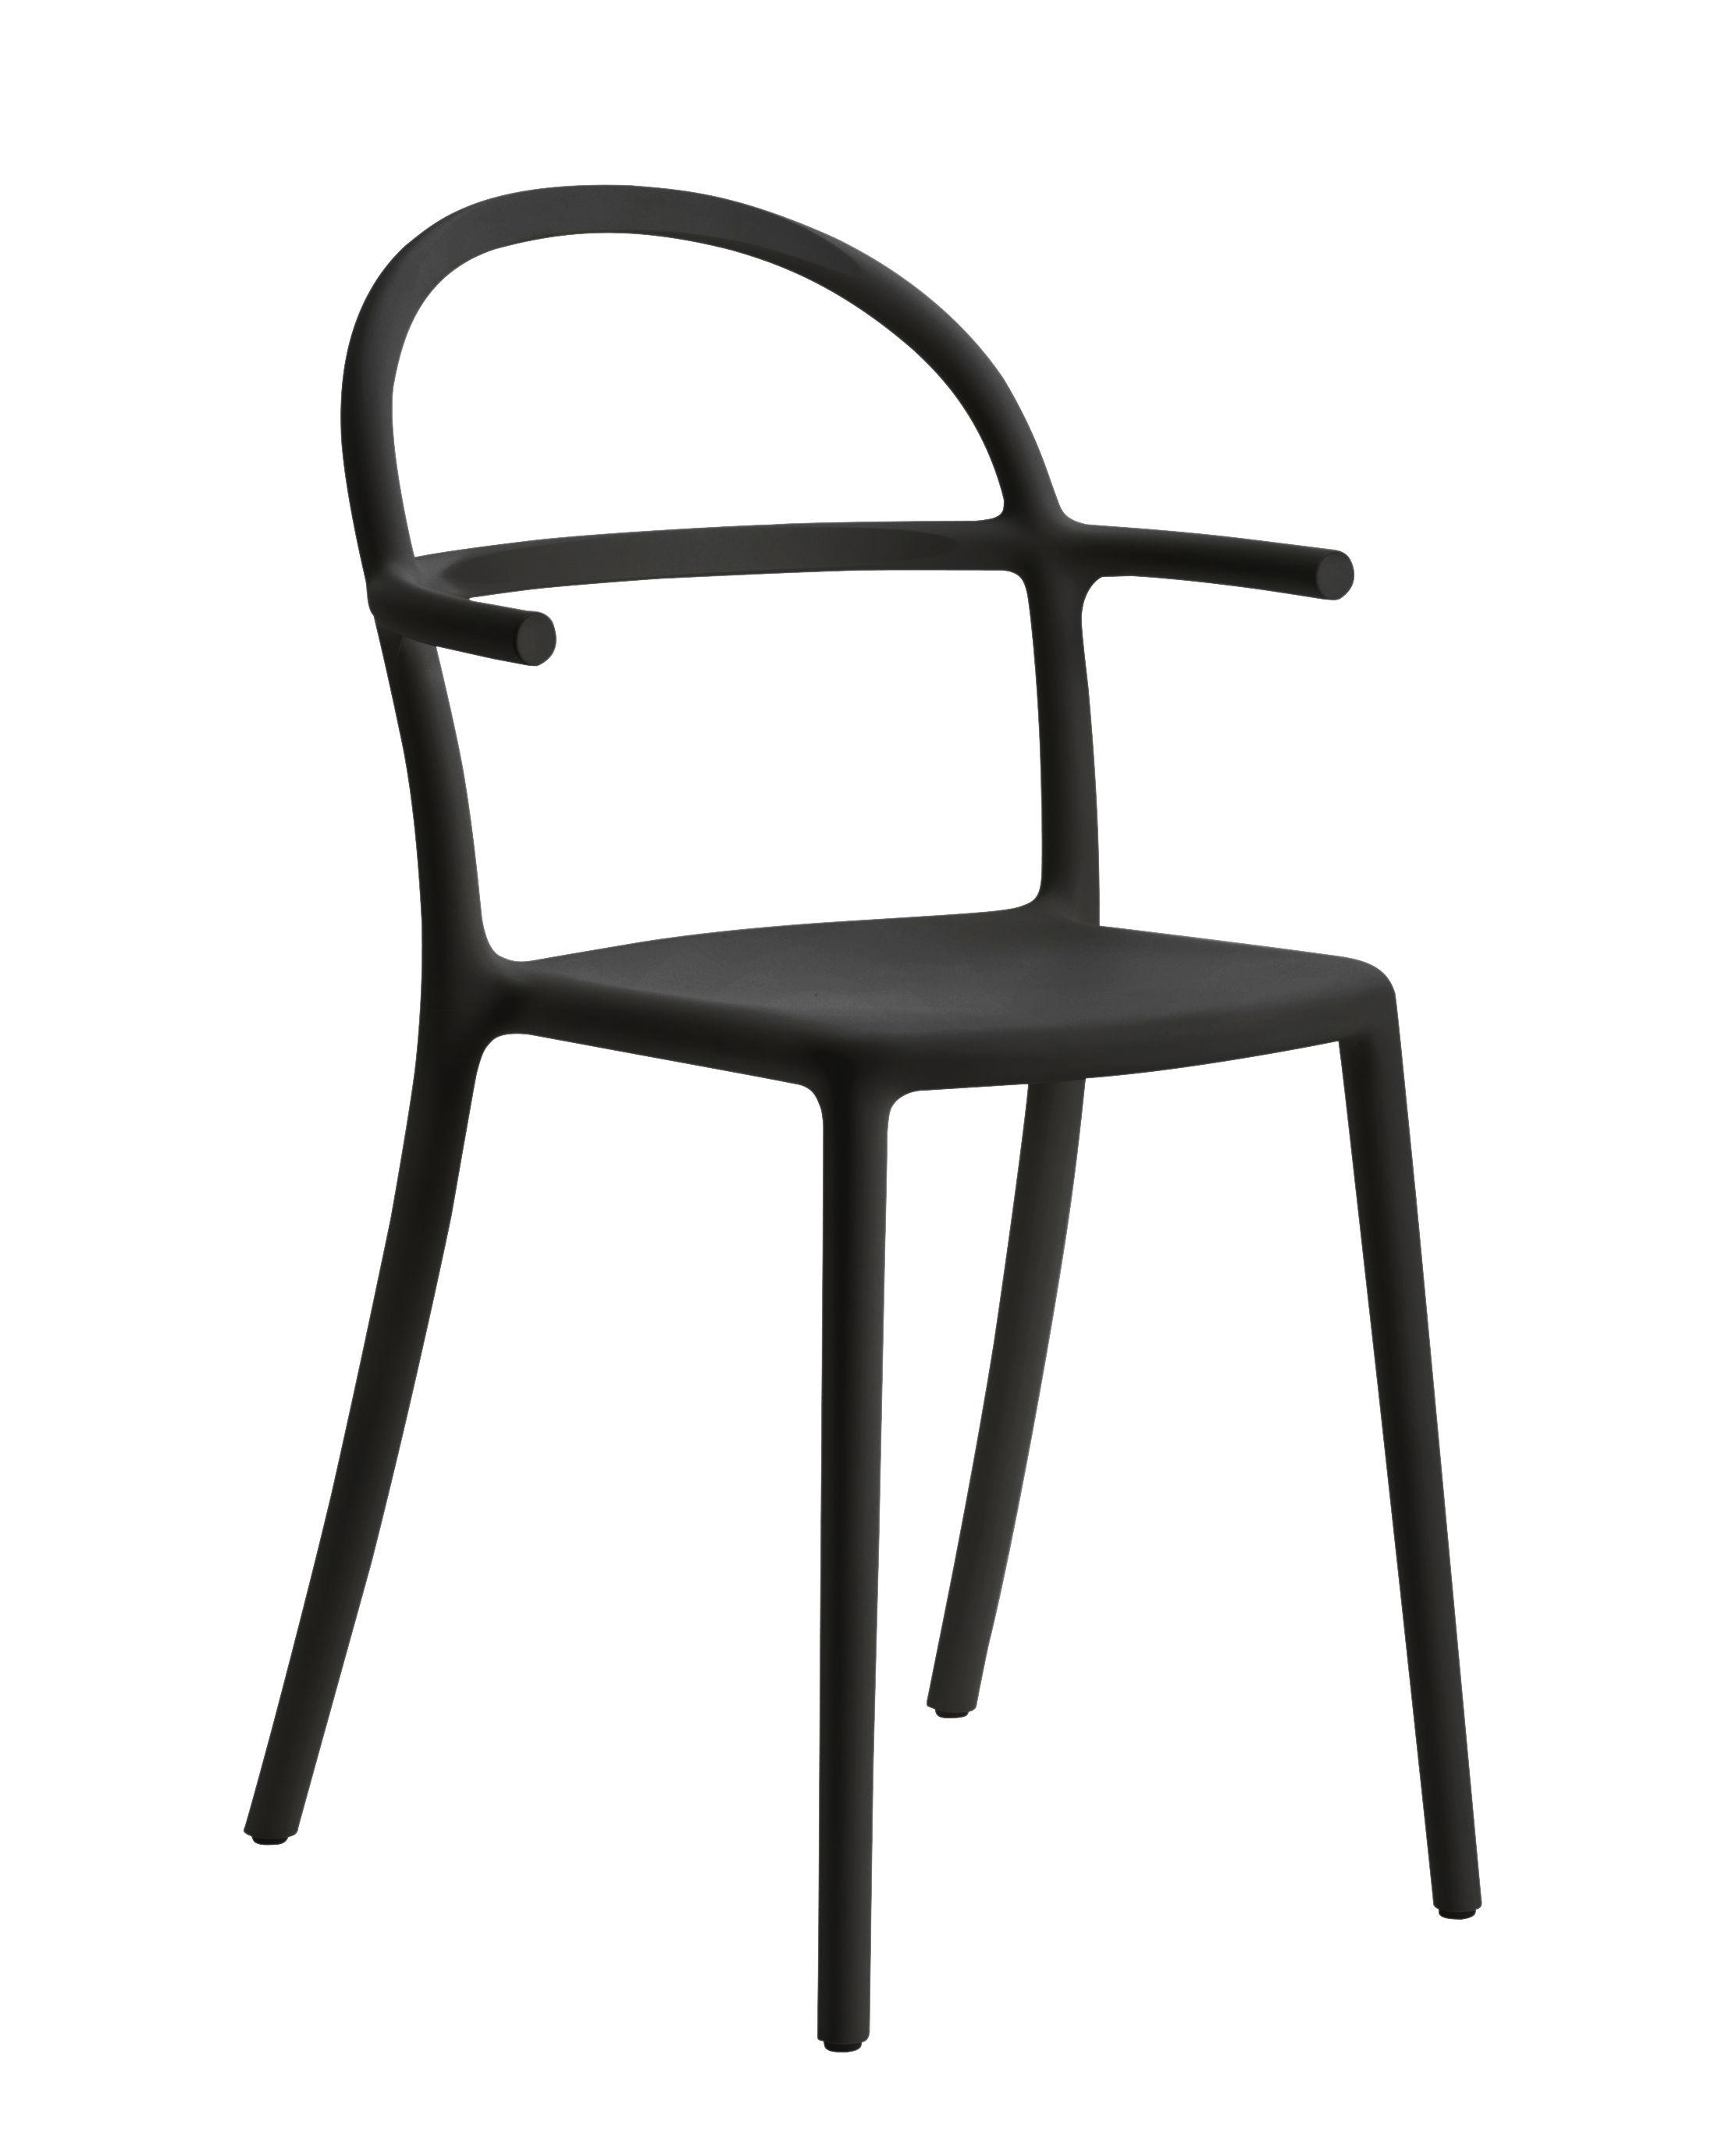 Furniture - Chairs - Generic C Stackable armchair - / Polypropylene by Kartell - Black - Polypropylene